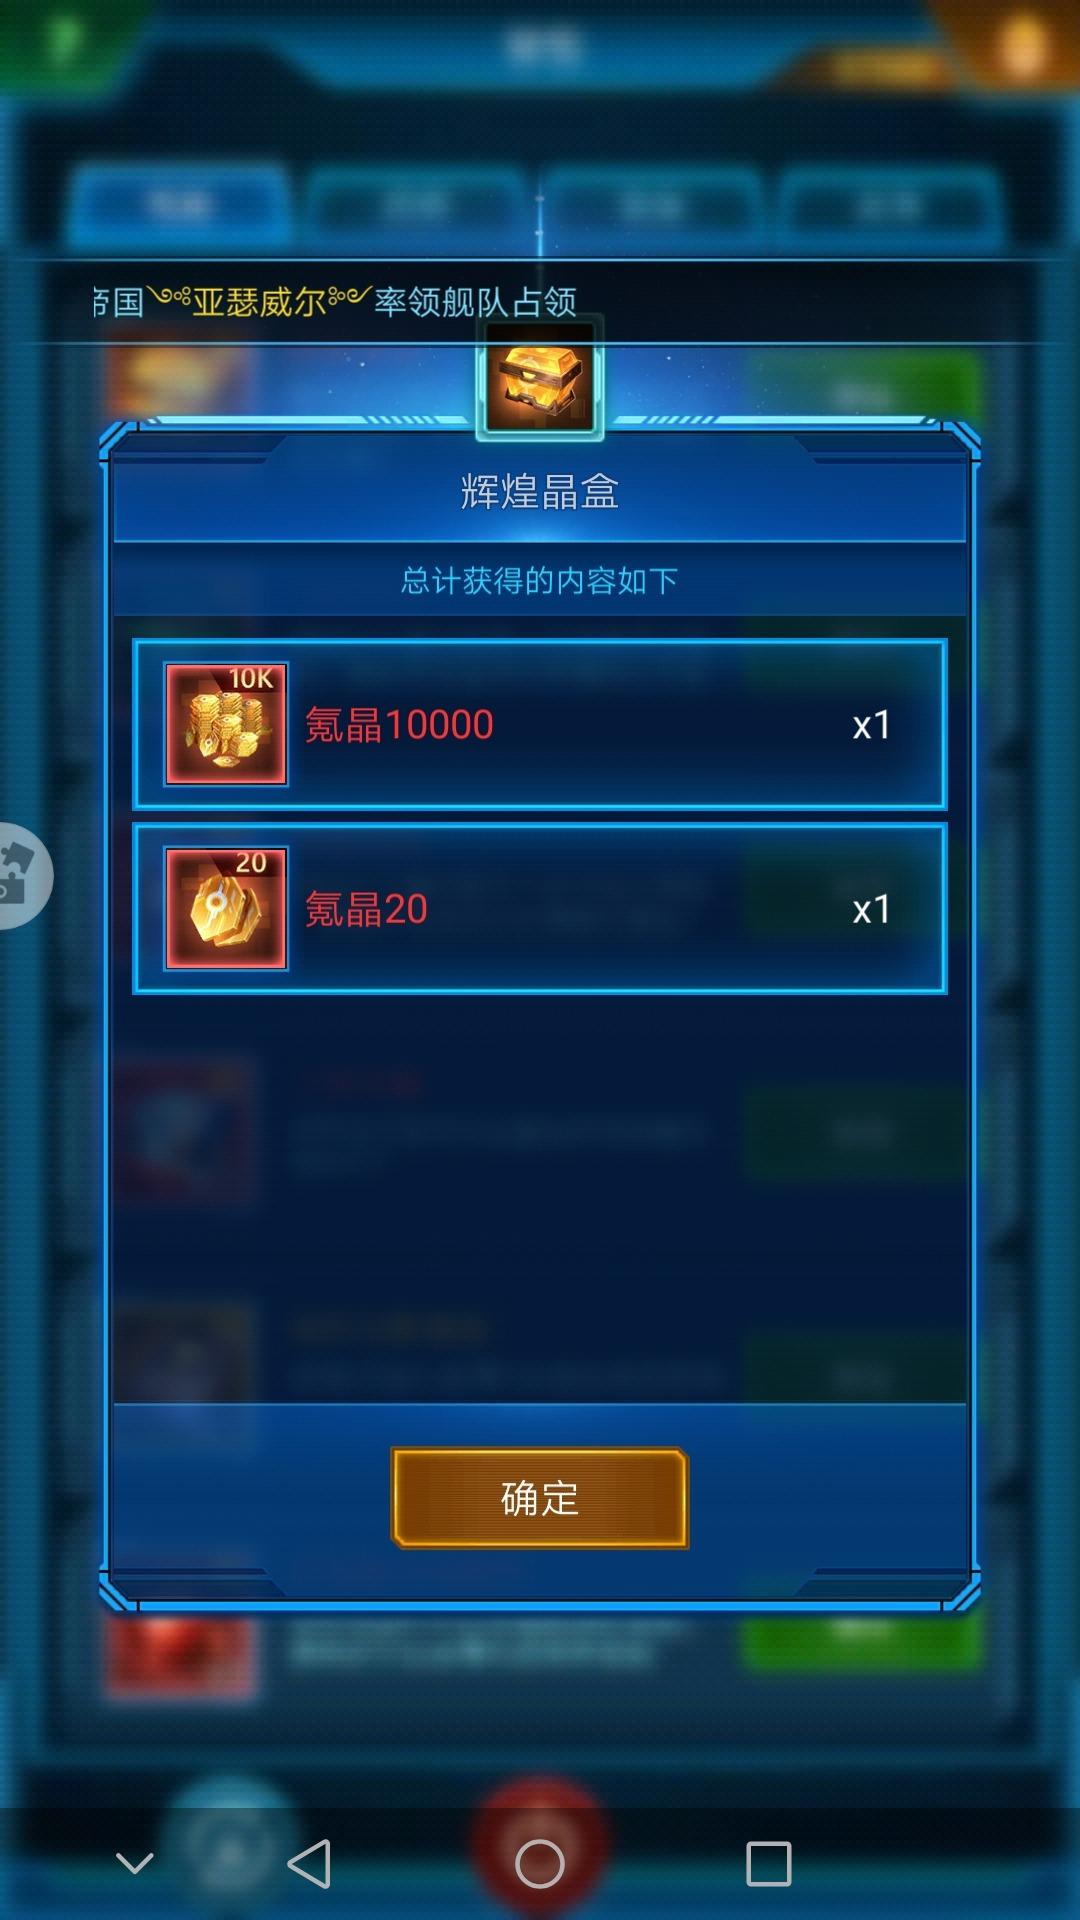 Screenshot_20190919_211613_com.jedigames.p16s.huawei.jpg